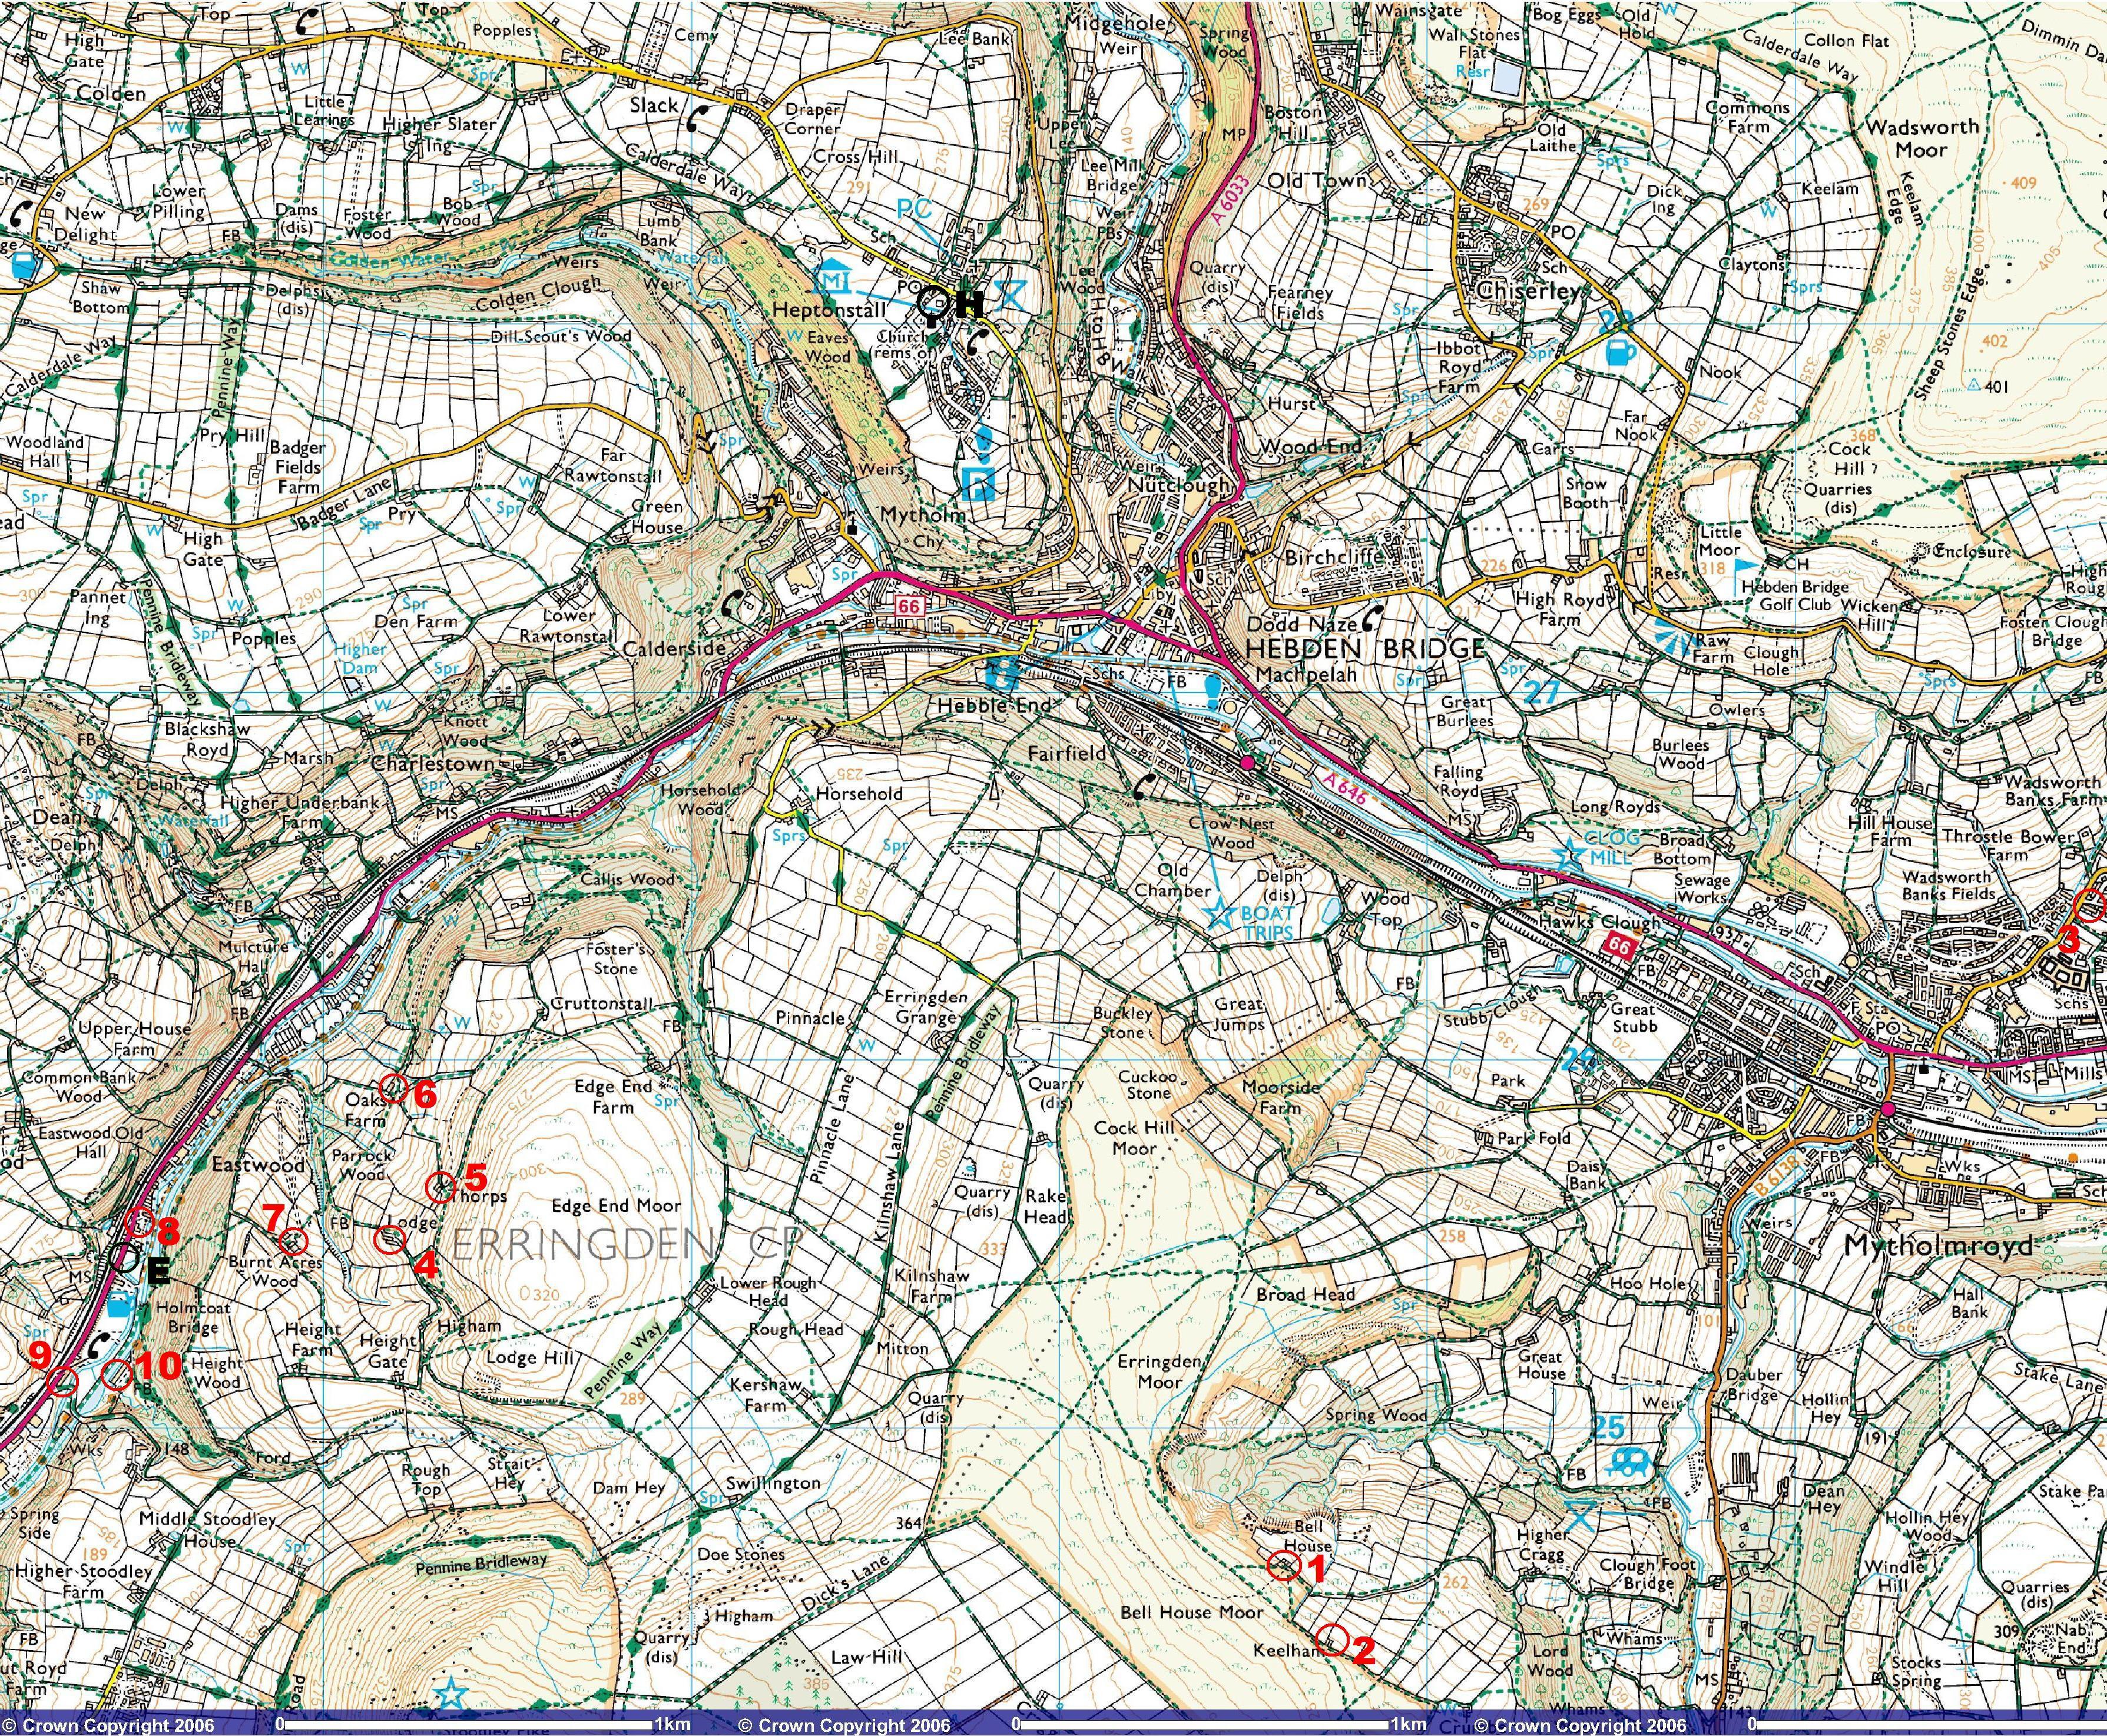 Ordnance Survey ni Historical Maps Ordnance Survey Get-a-map